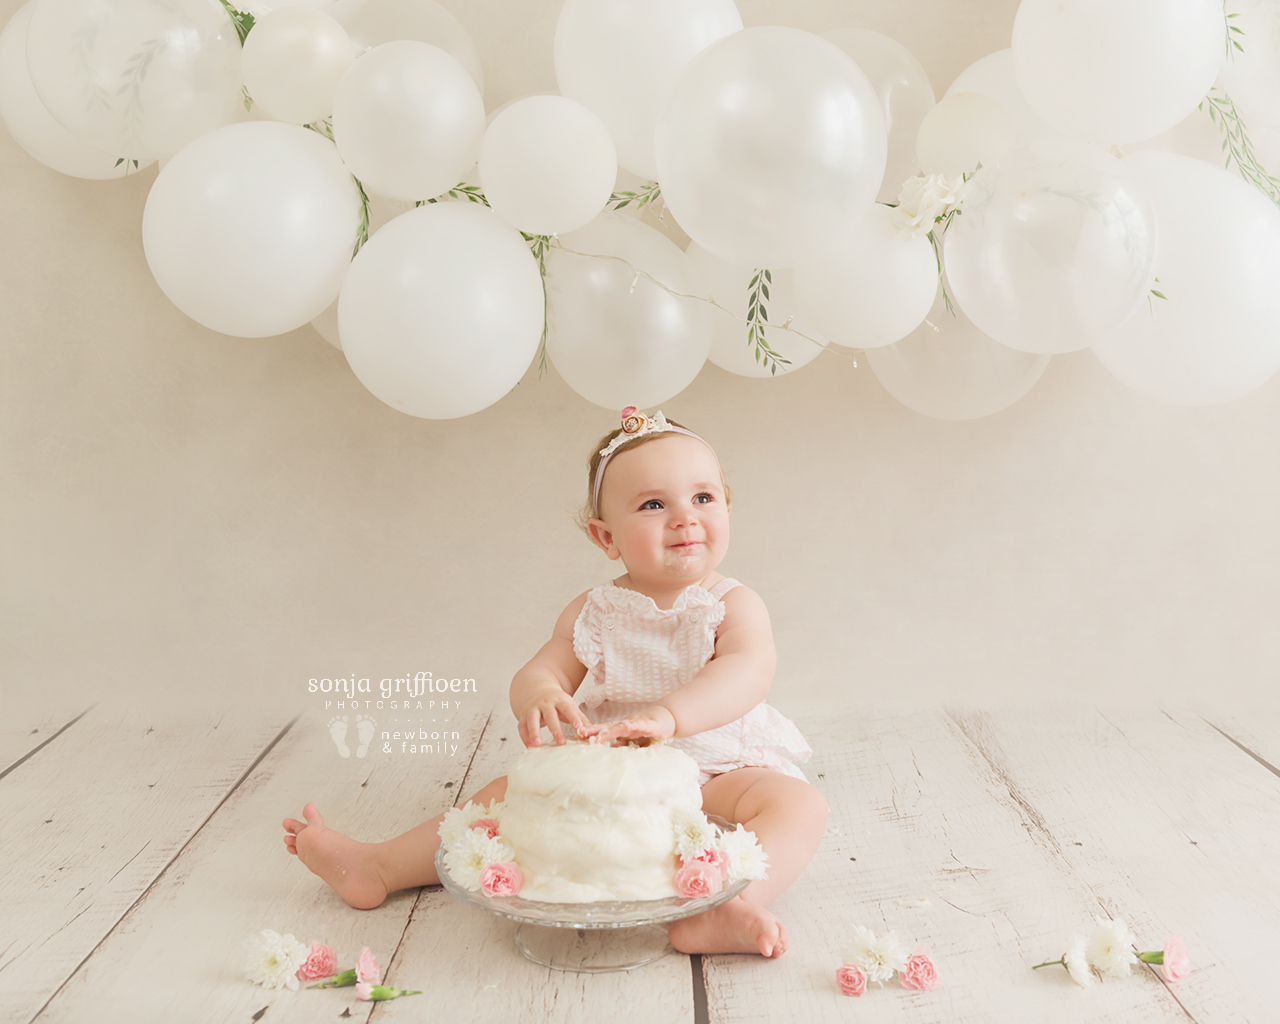 Vivienne-Cake-Smash-Brisbane-Baby-Photographer-Sonja-Griffioen-04.jpg